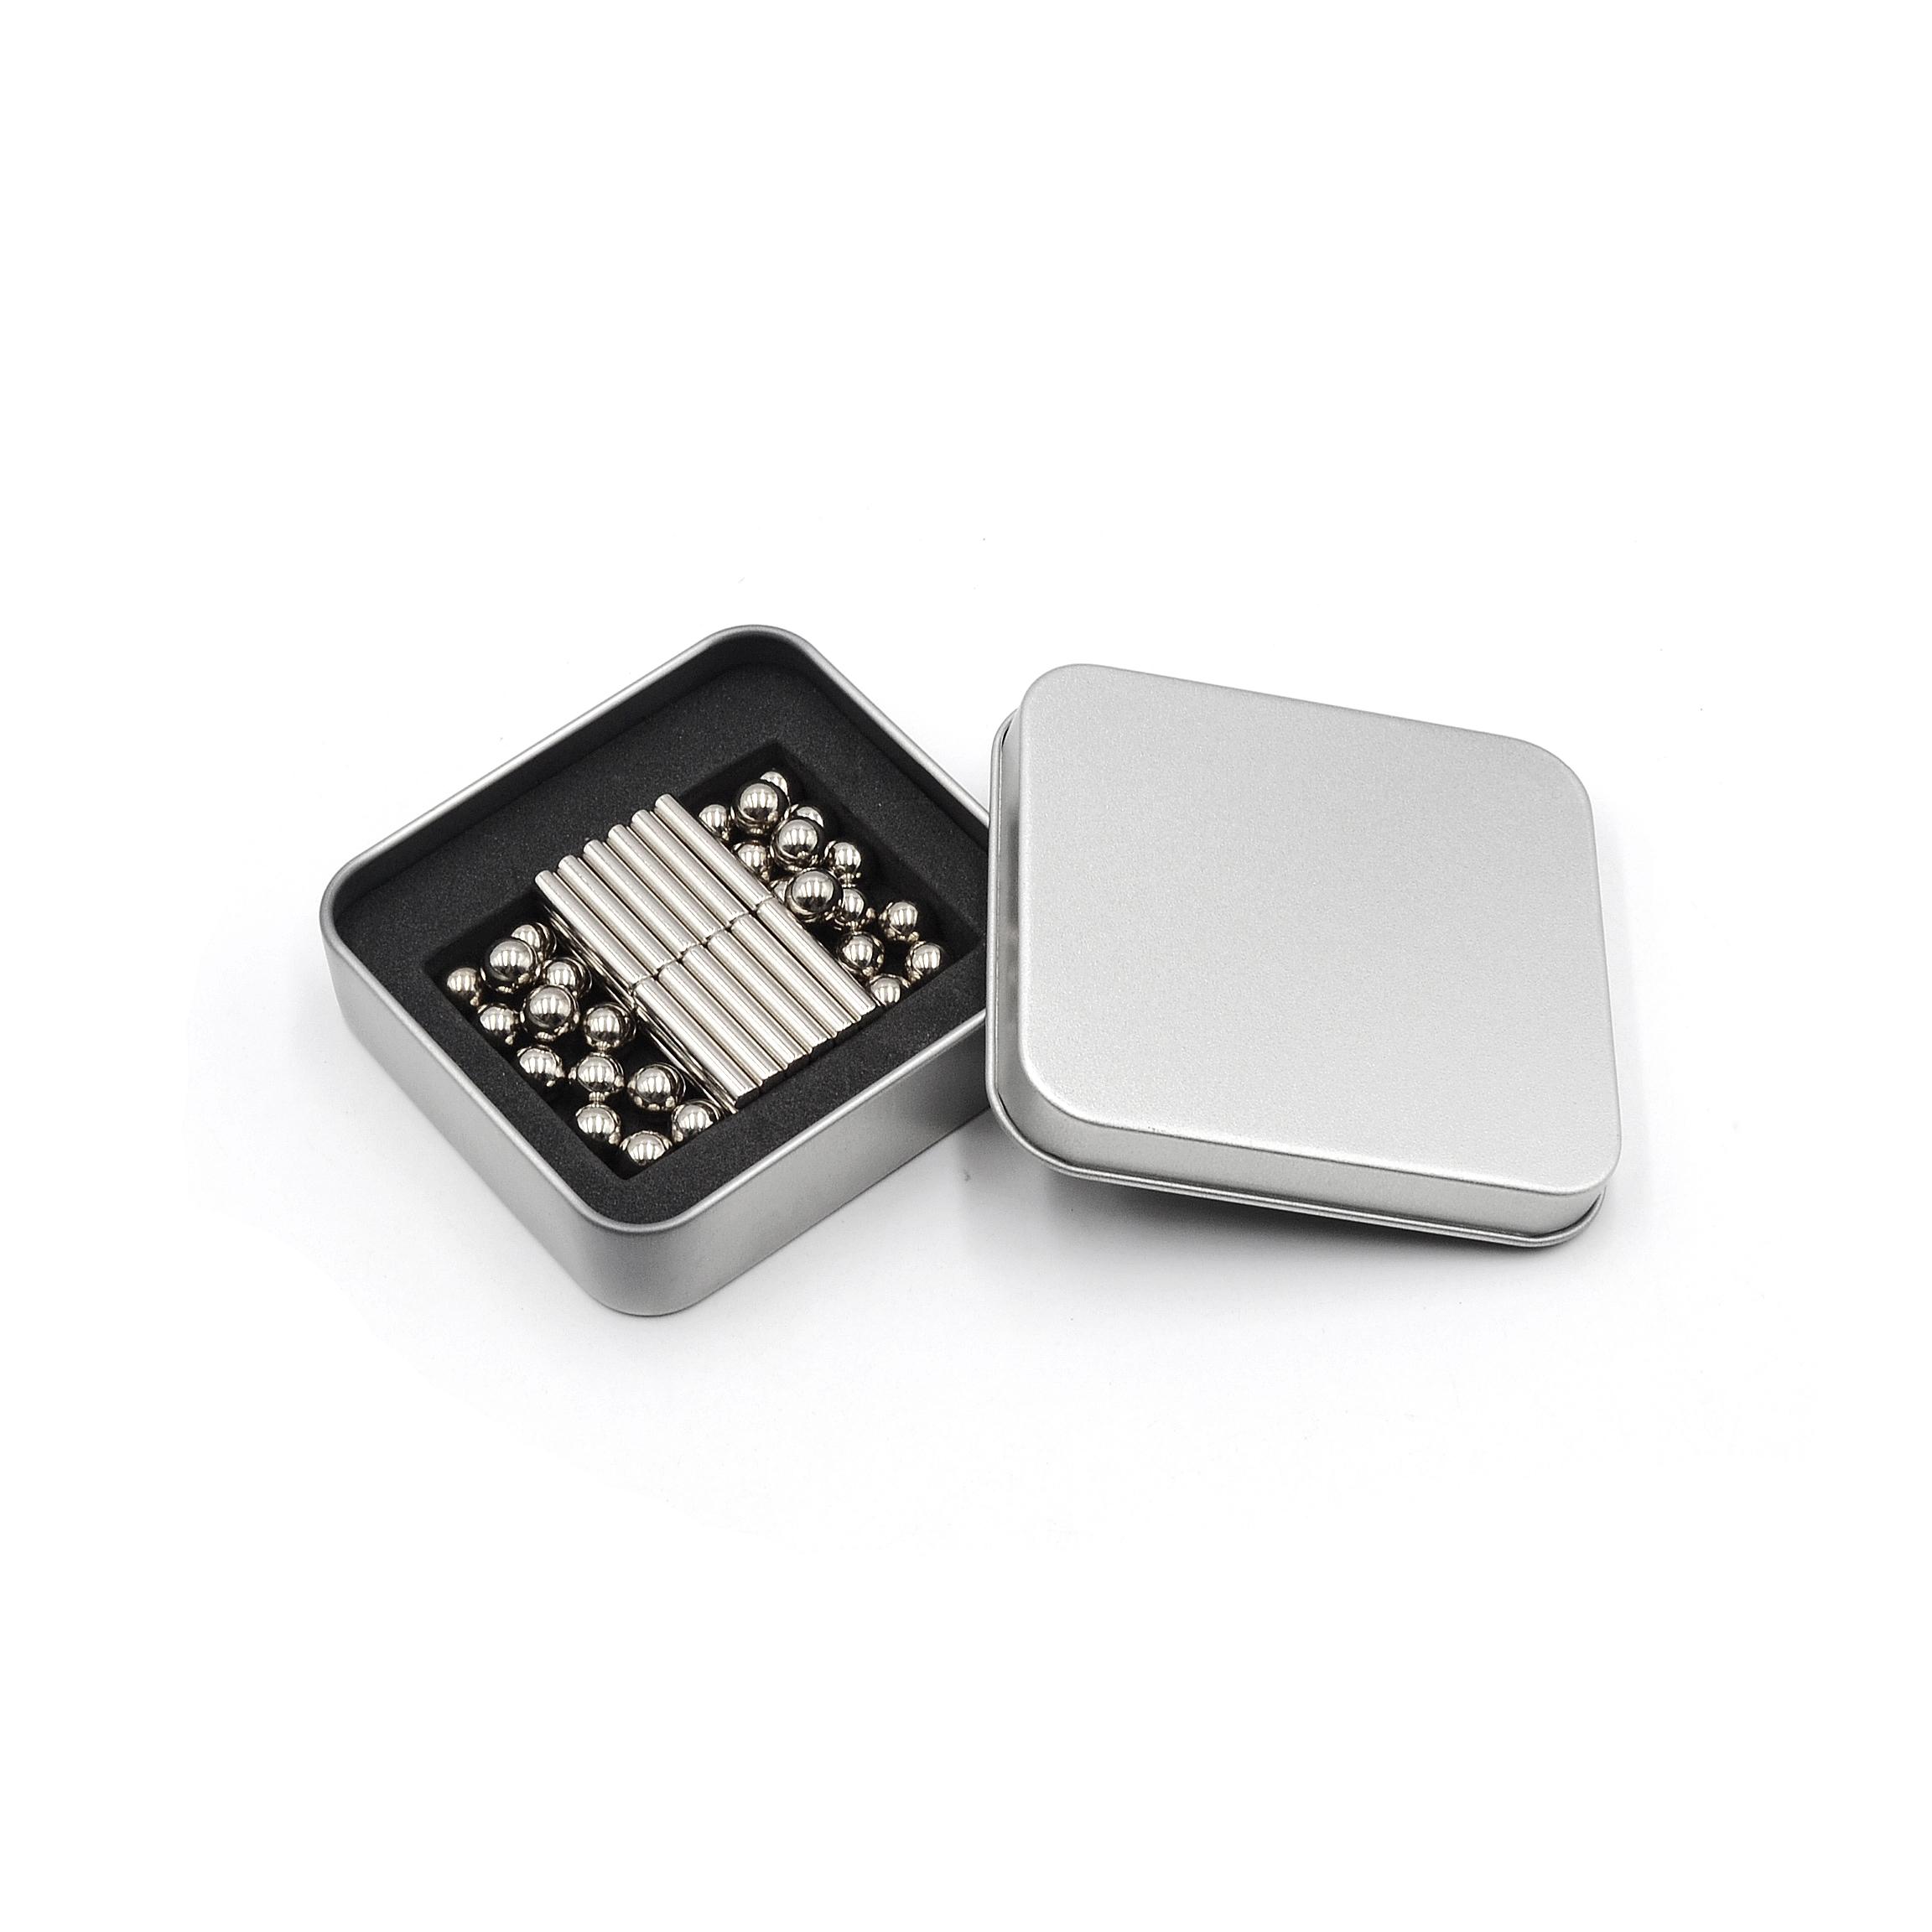 100 x Neodymium Cube Magnete Super Stark Magnetic Rare Erde Block NdFeb N42